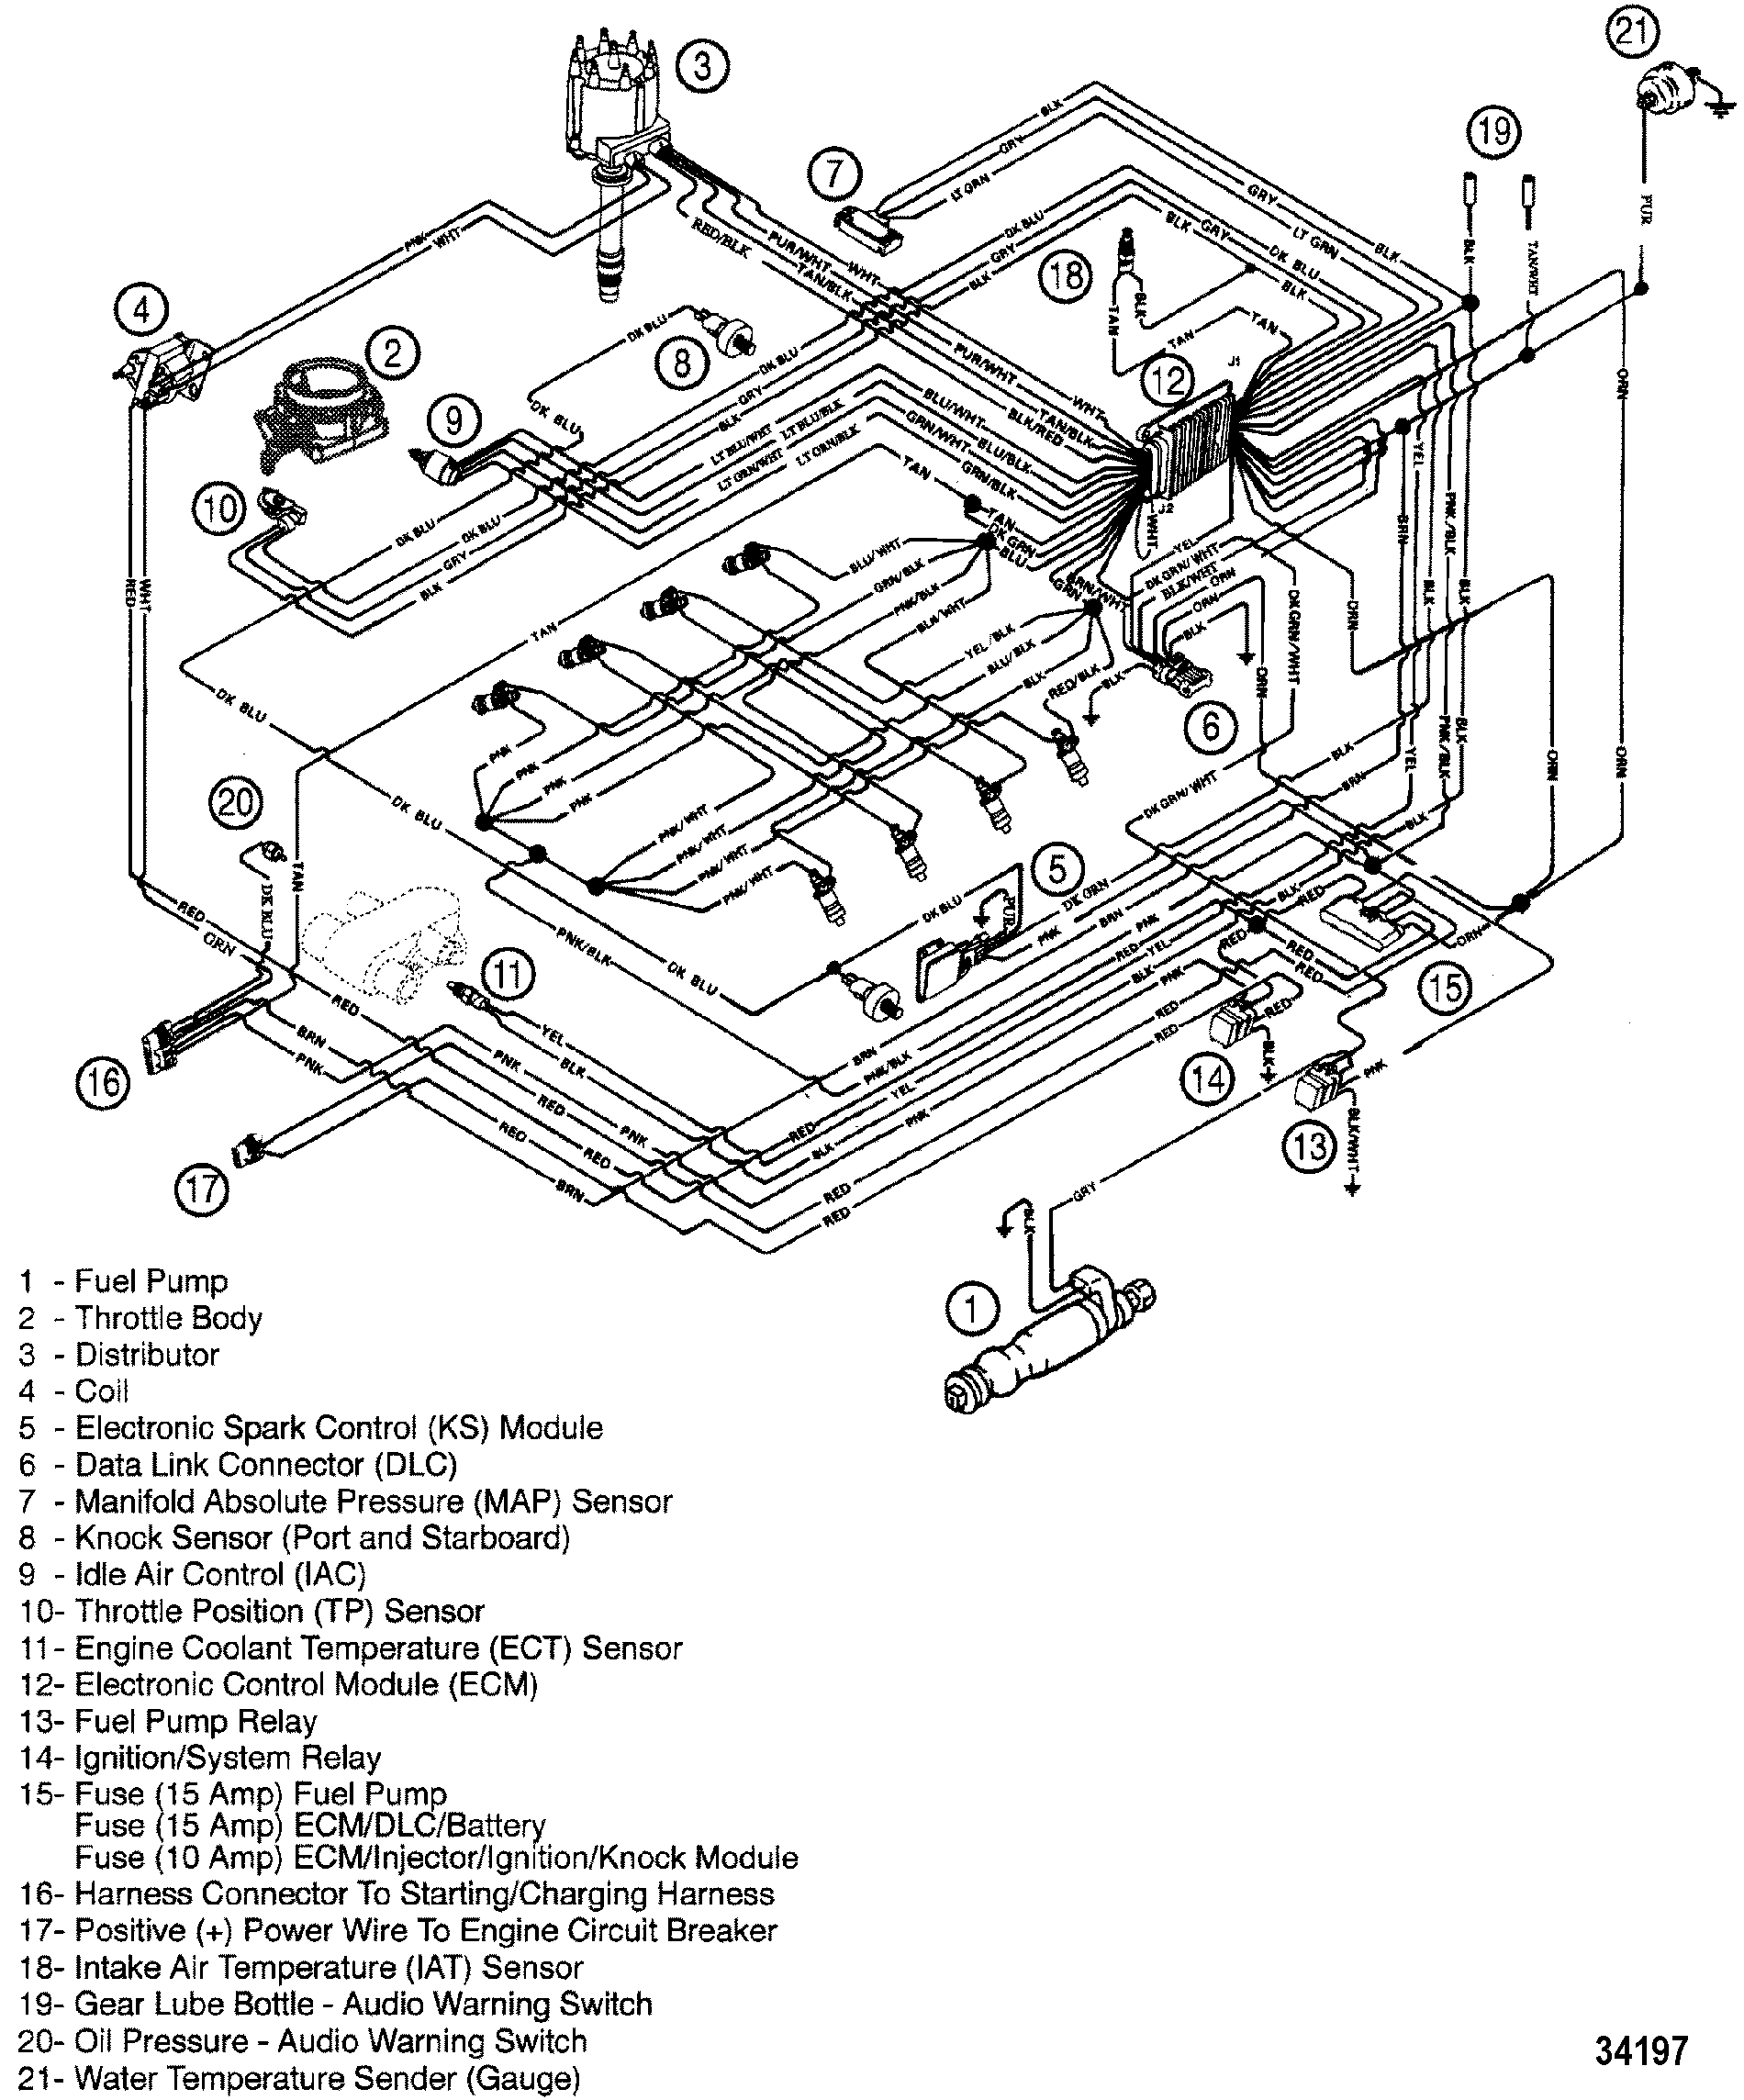 New Wire Harness Sample Diagram Wiringdiagram